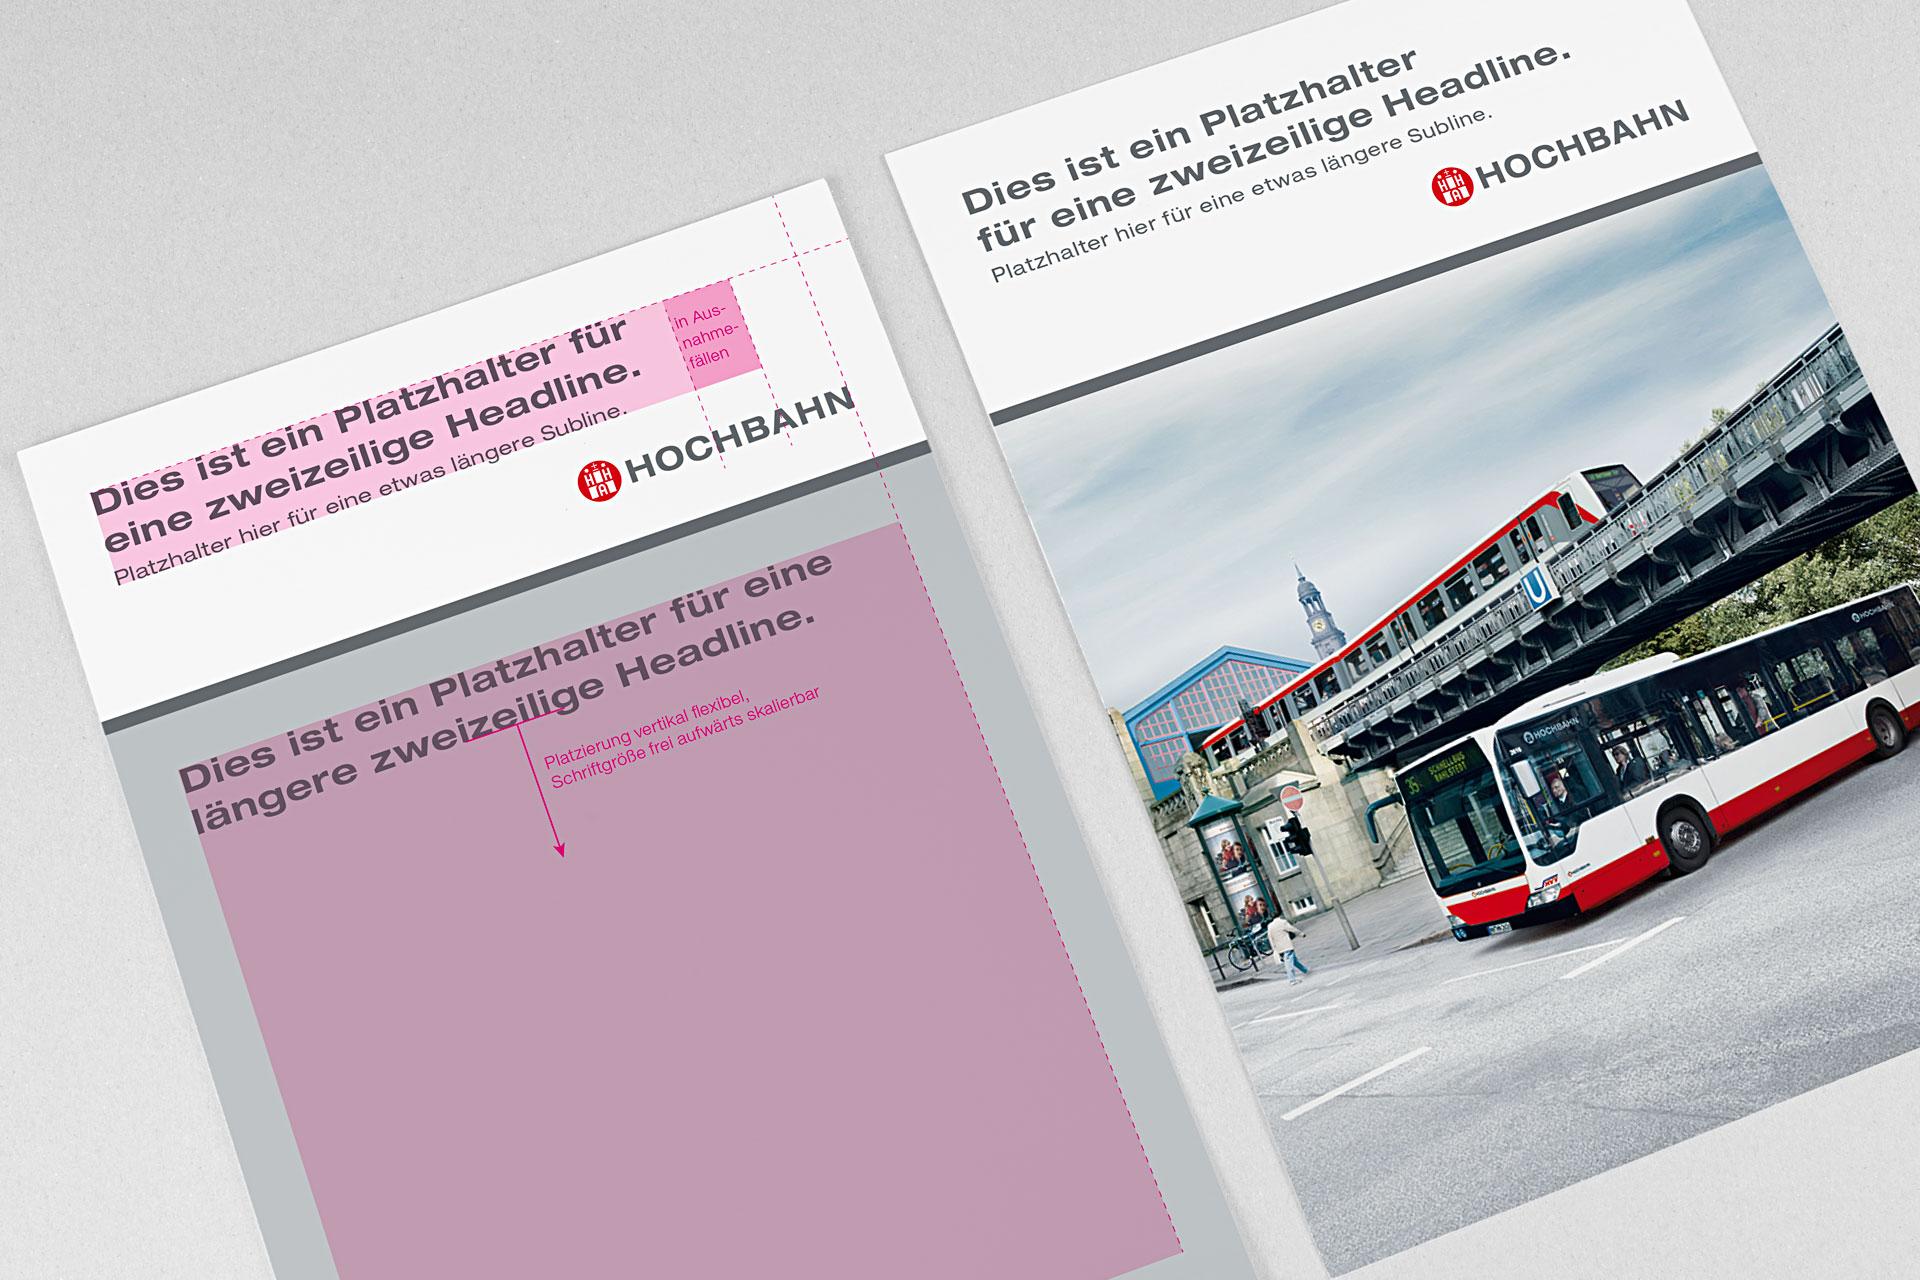 hochbahn-corporate-design